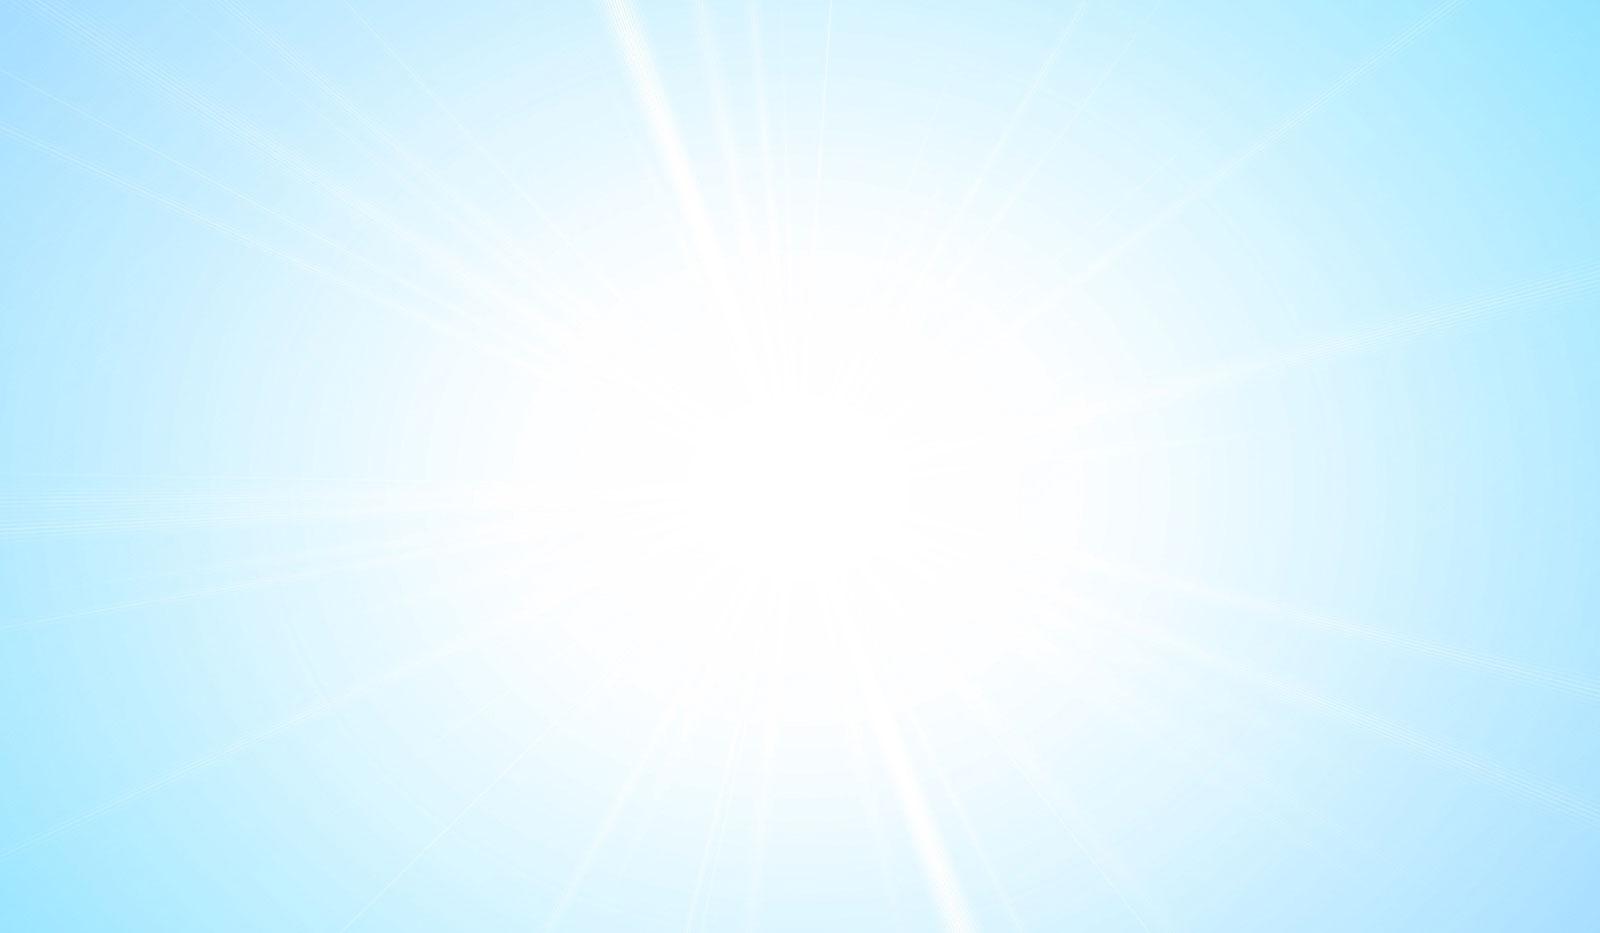 Himmel mit strahlender Sonne